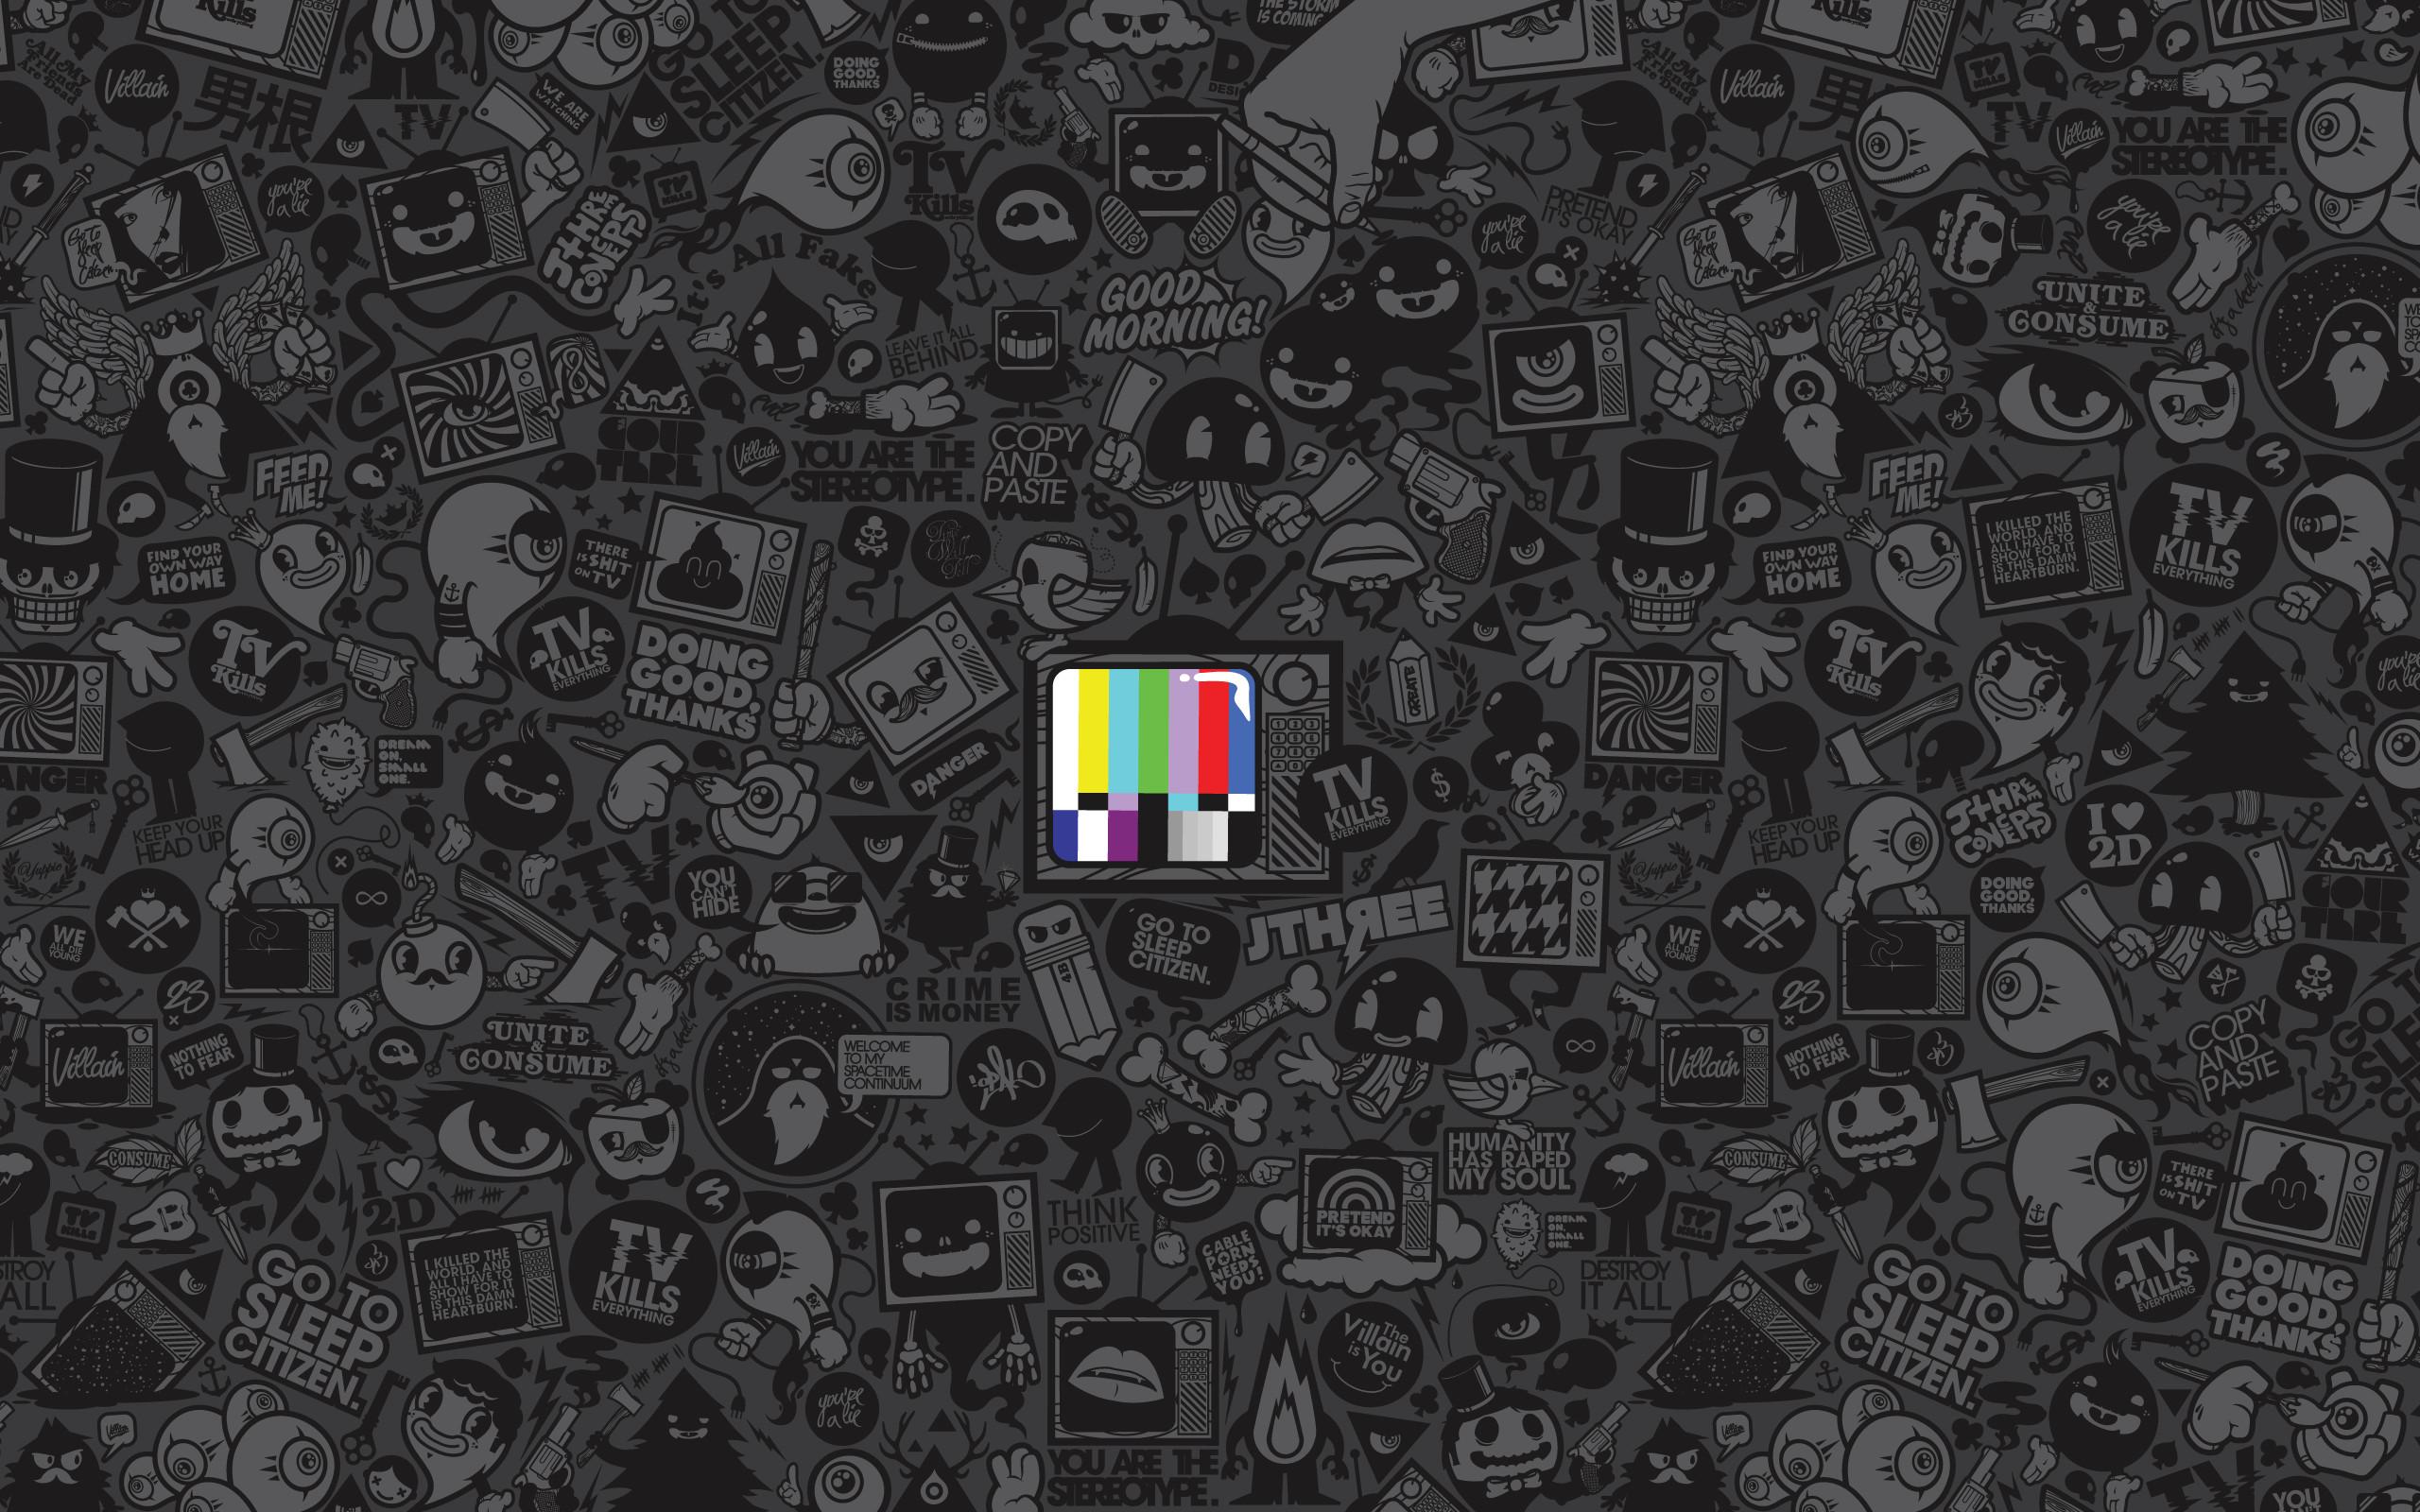 … TV kills HD Wallpaper 2560×1600